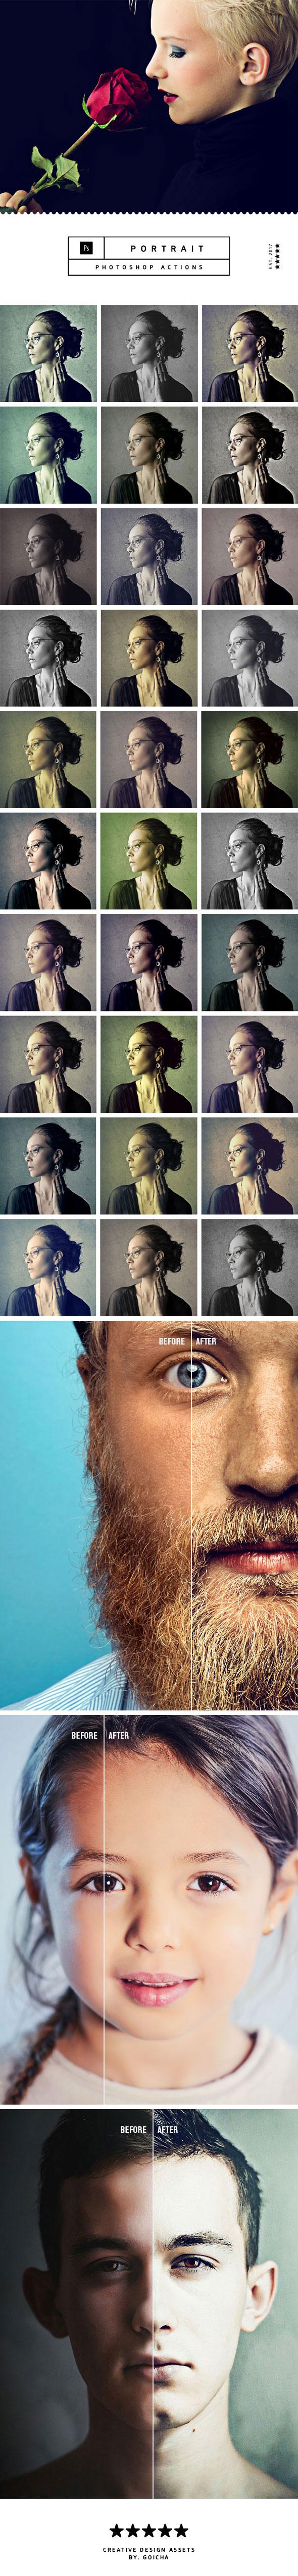 Portrait Photoshop Actions - Photo Effects Actions